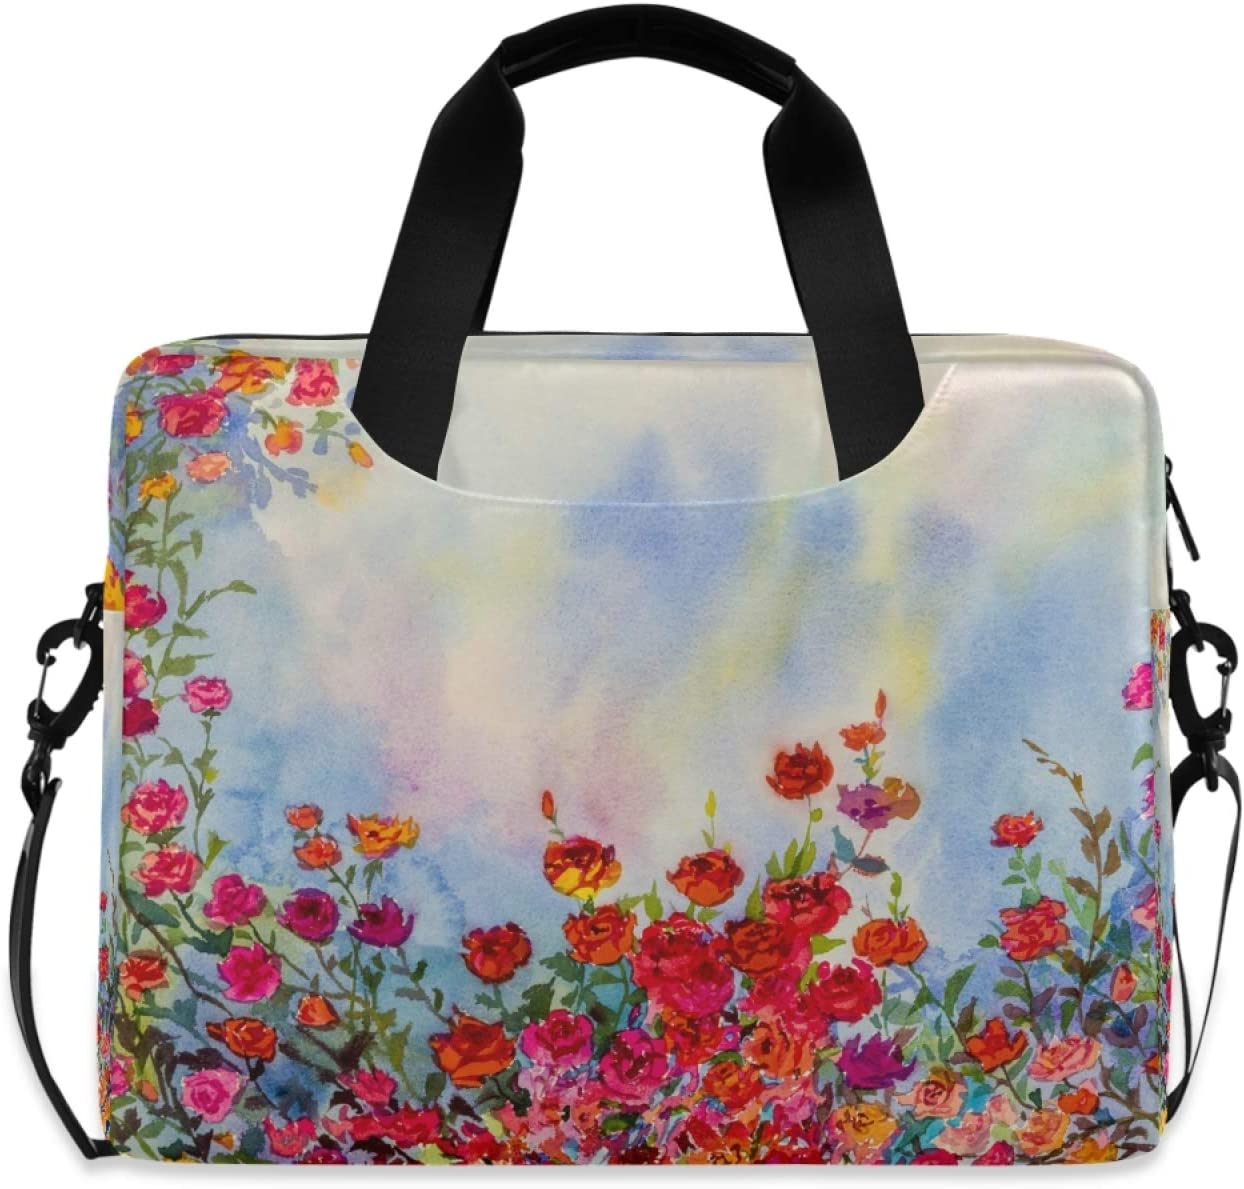 Ombra Laptop Shoulder Large discharge sale Bag Art Painting La Flower Floral Portable Max 51% OFF